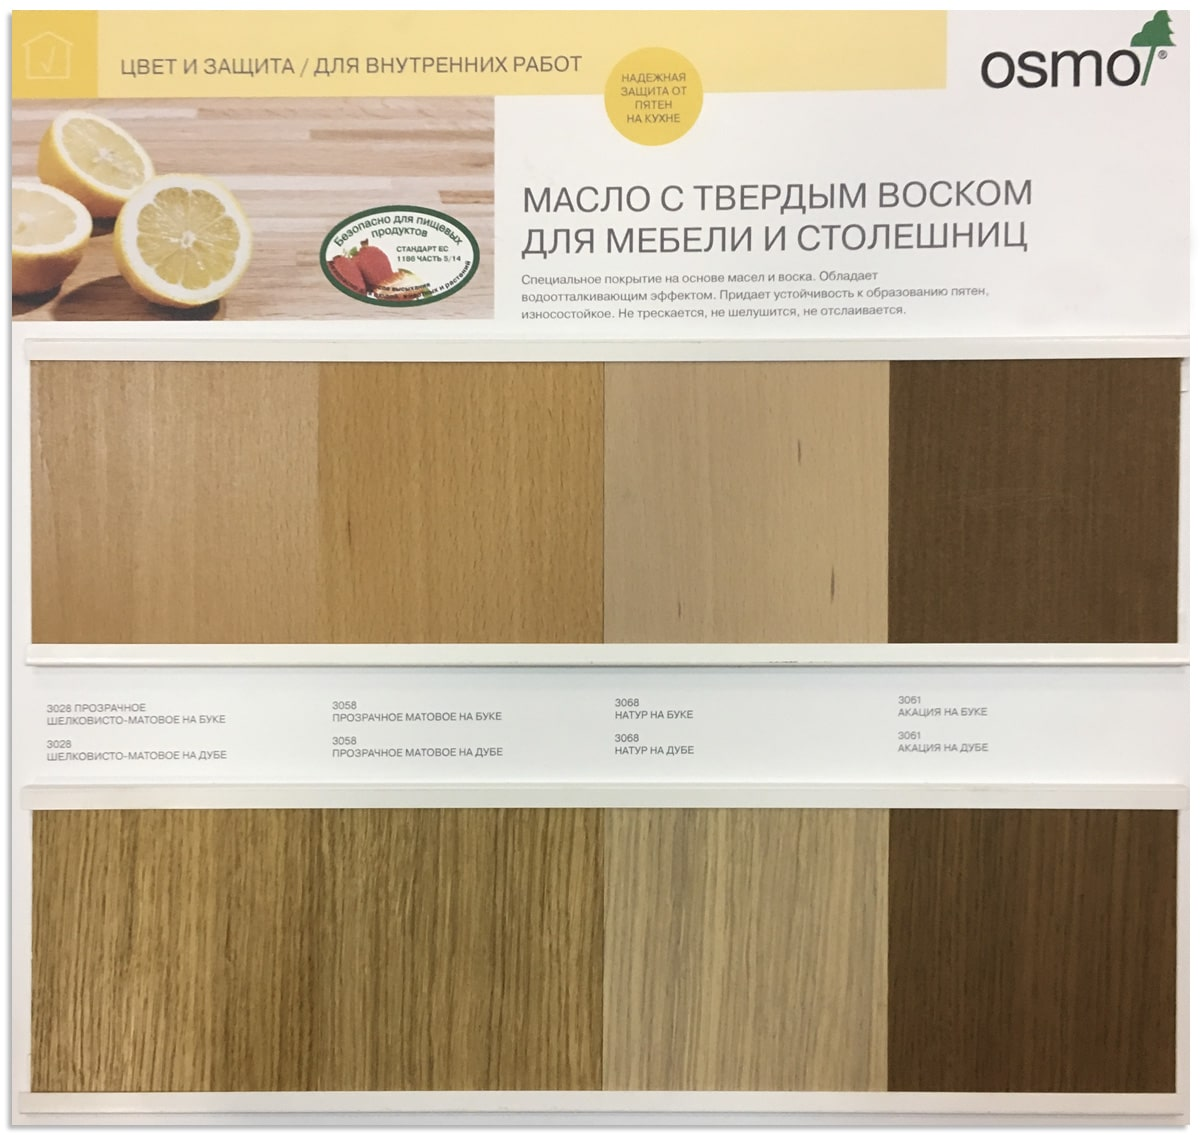 Масло для столешниц и мебели OSMO Topoil - Выкрас на дубе